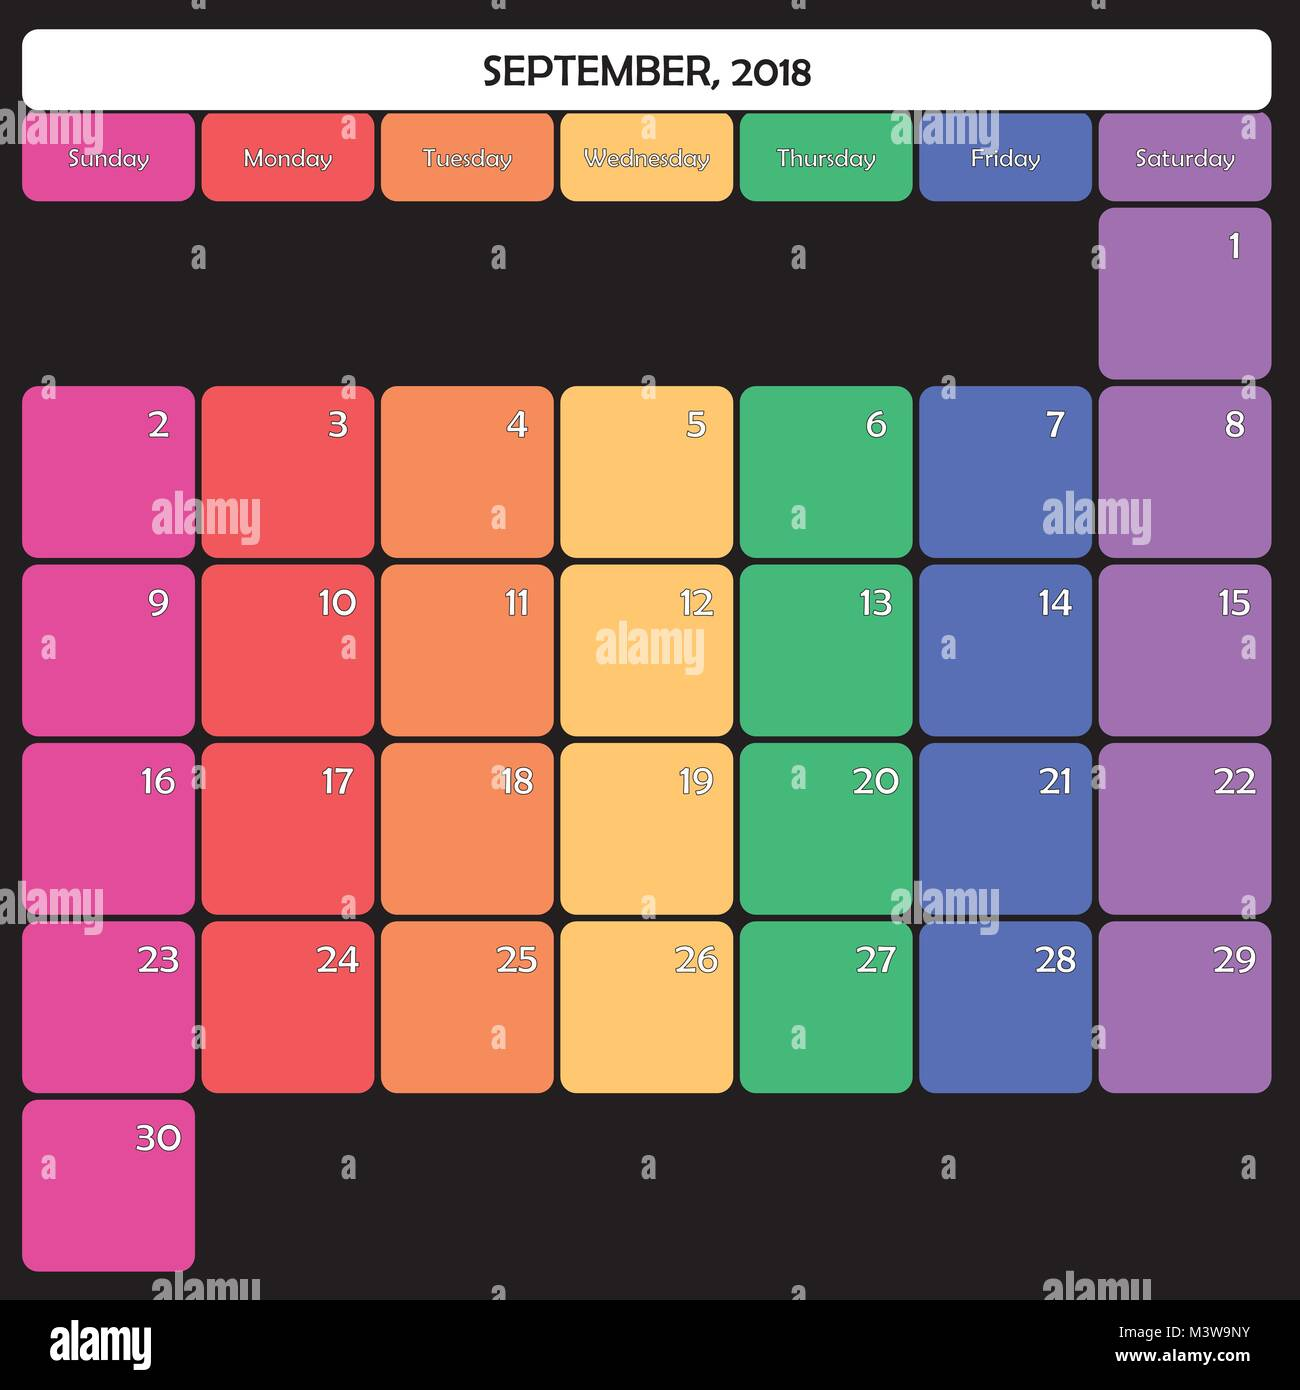 Big Calendar Planner : Calendar stock vector images alamy